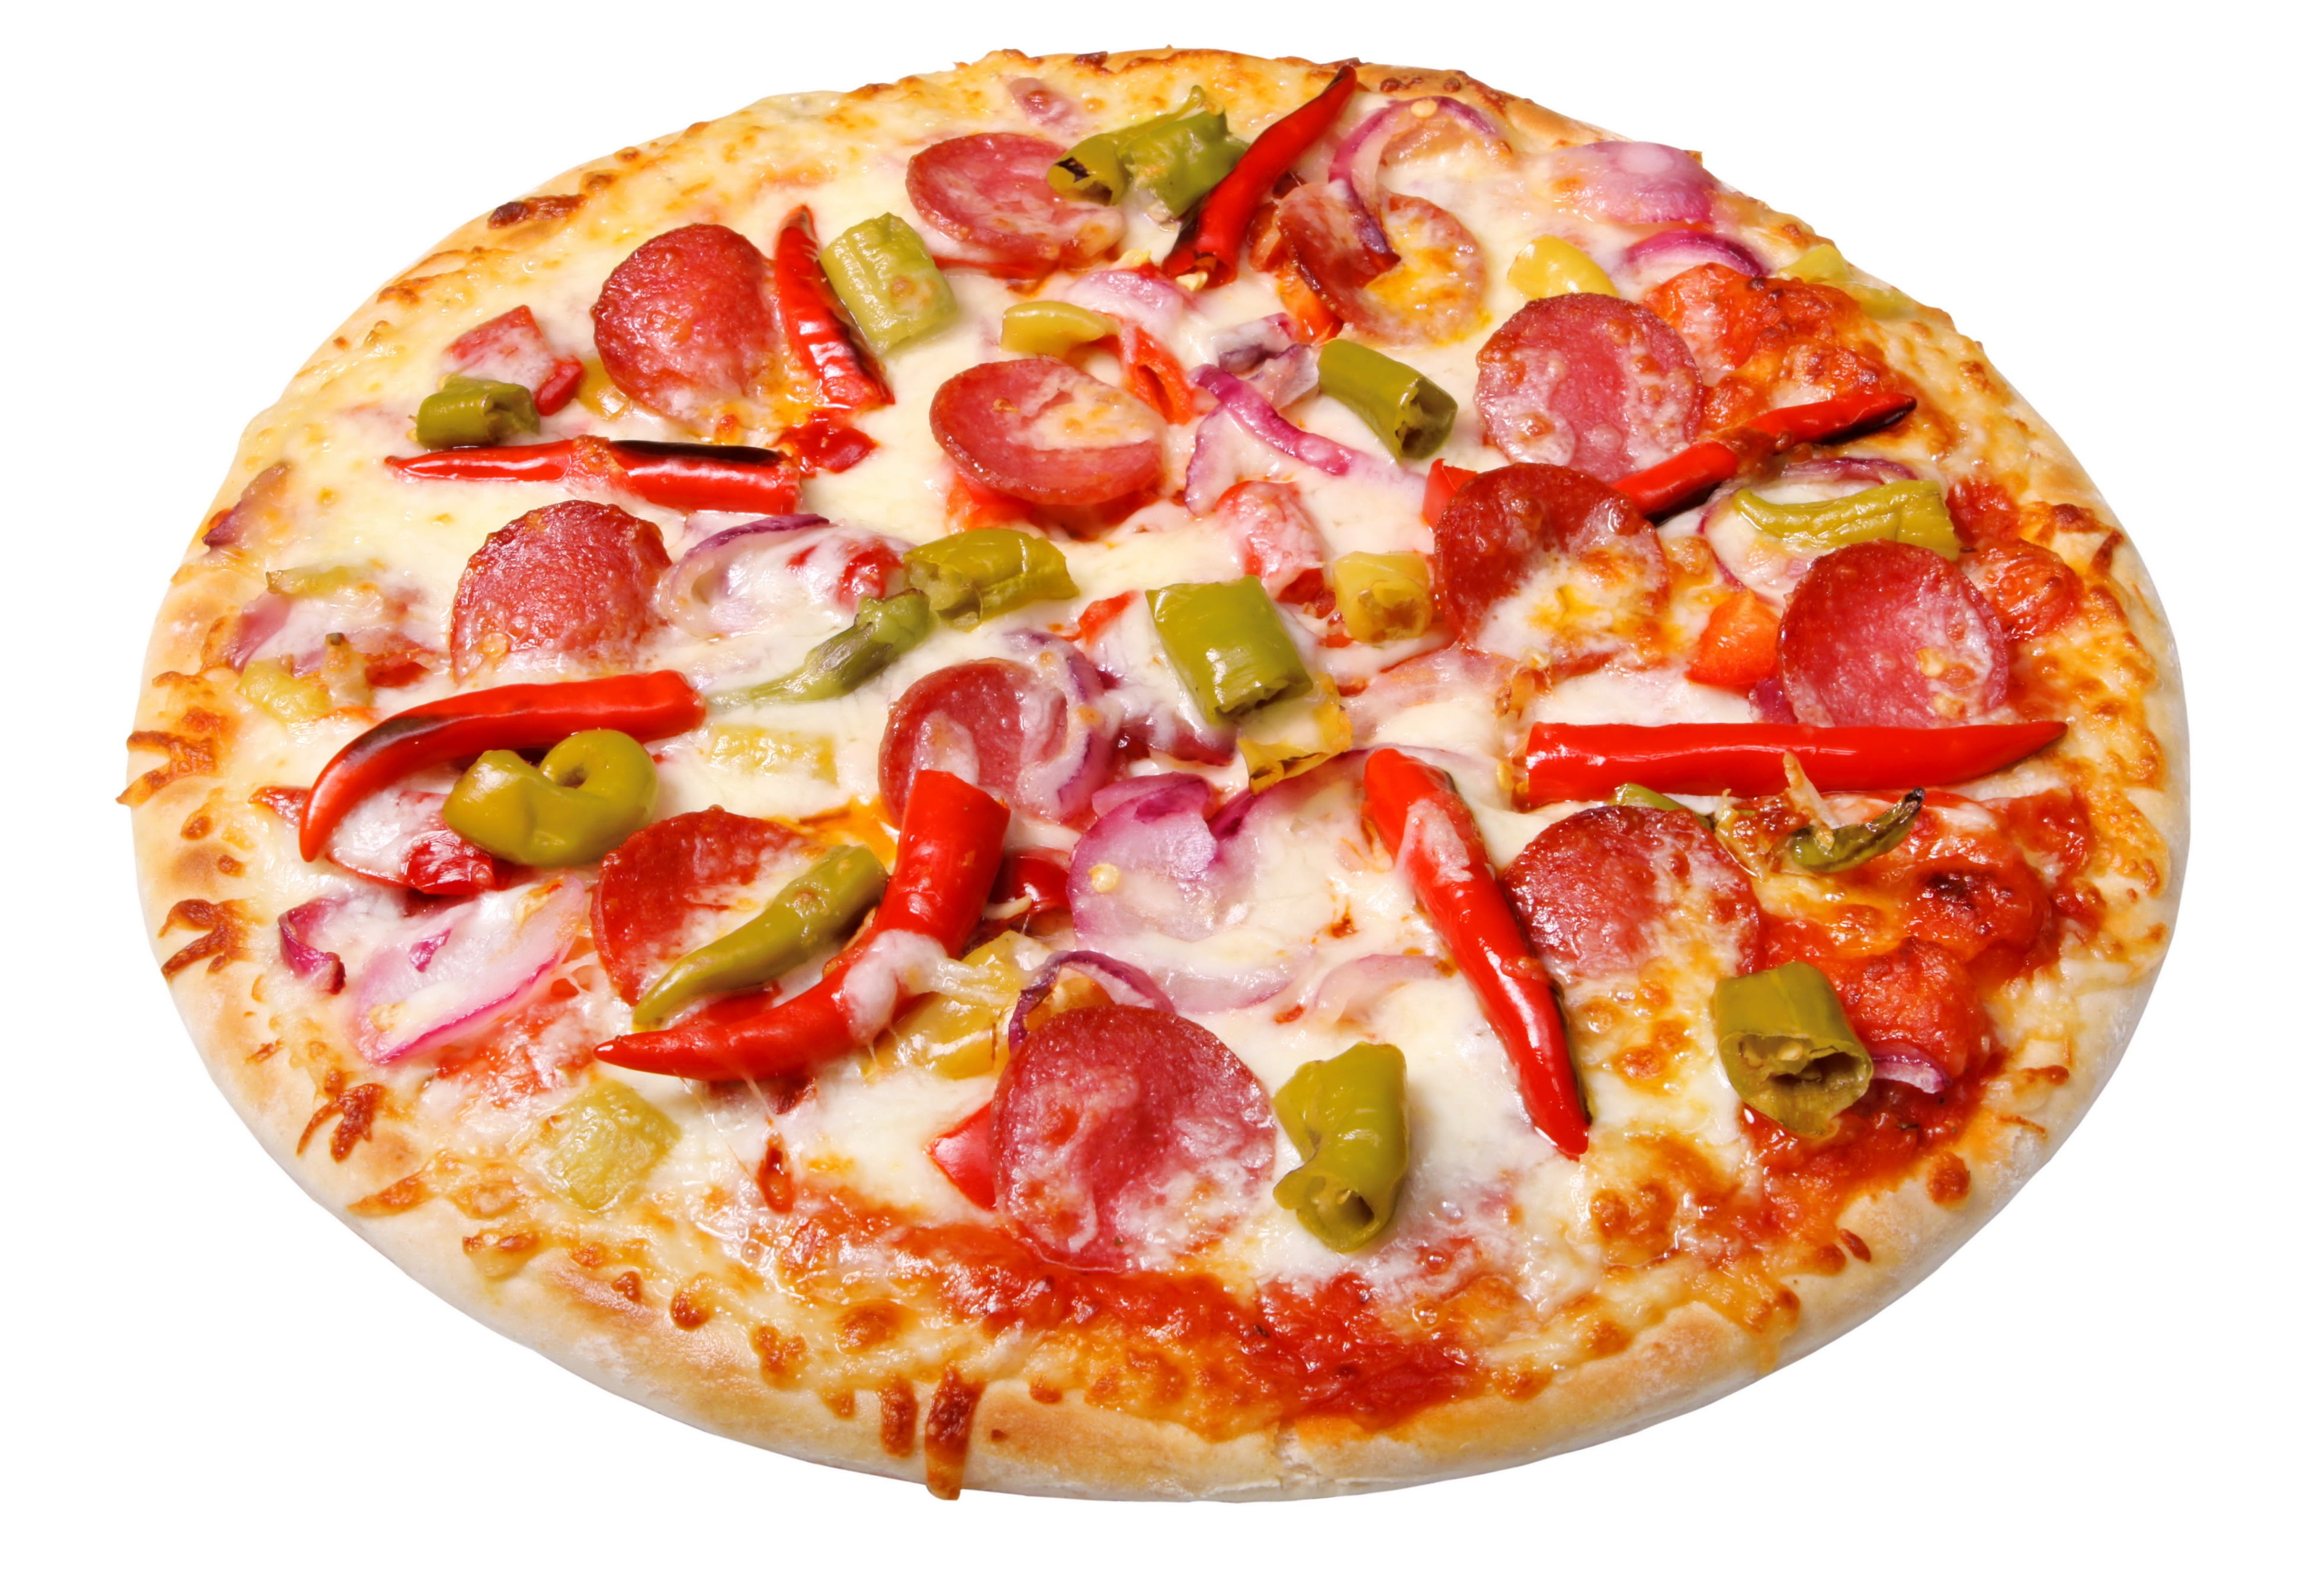 Whole pepperoni and chili pizza HD wallpaper Wallpaper Flare 3900x2695